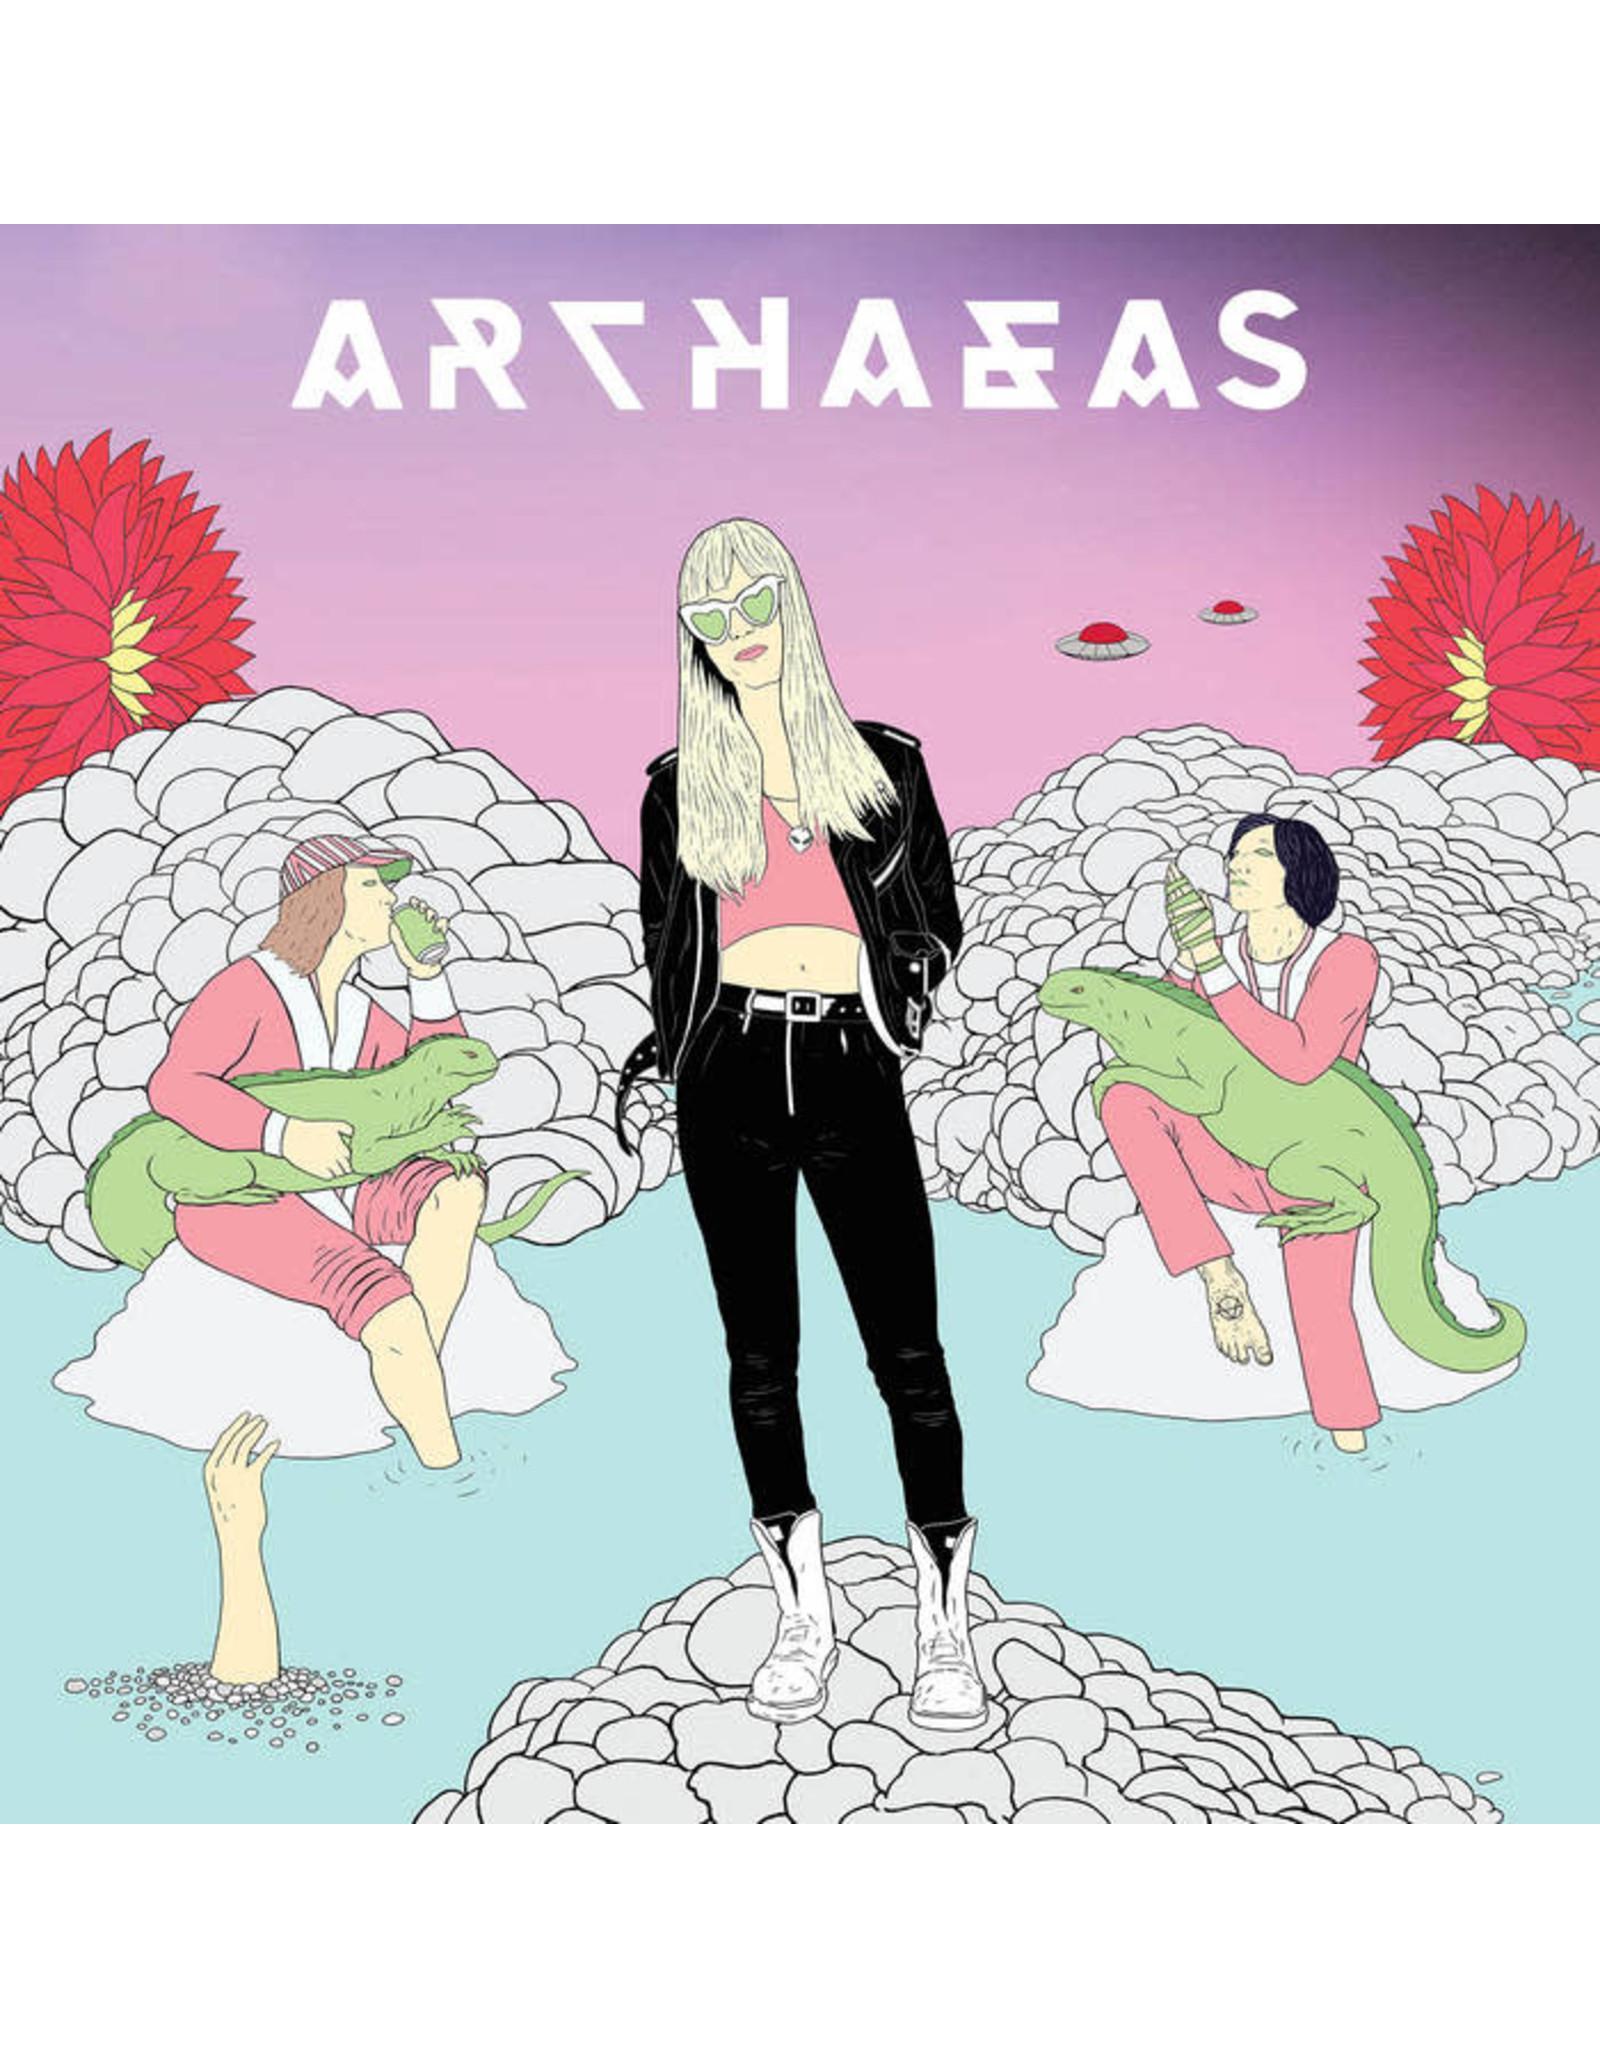 New Vinyl The Archaeas - S/T LP